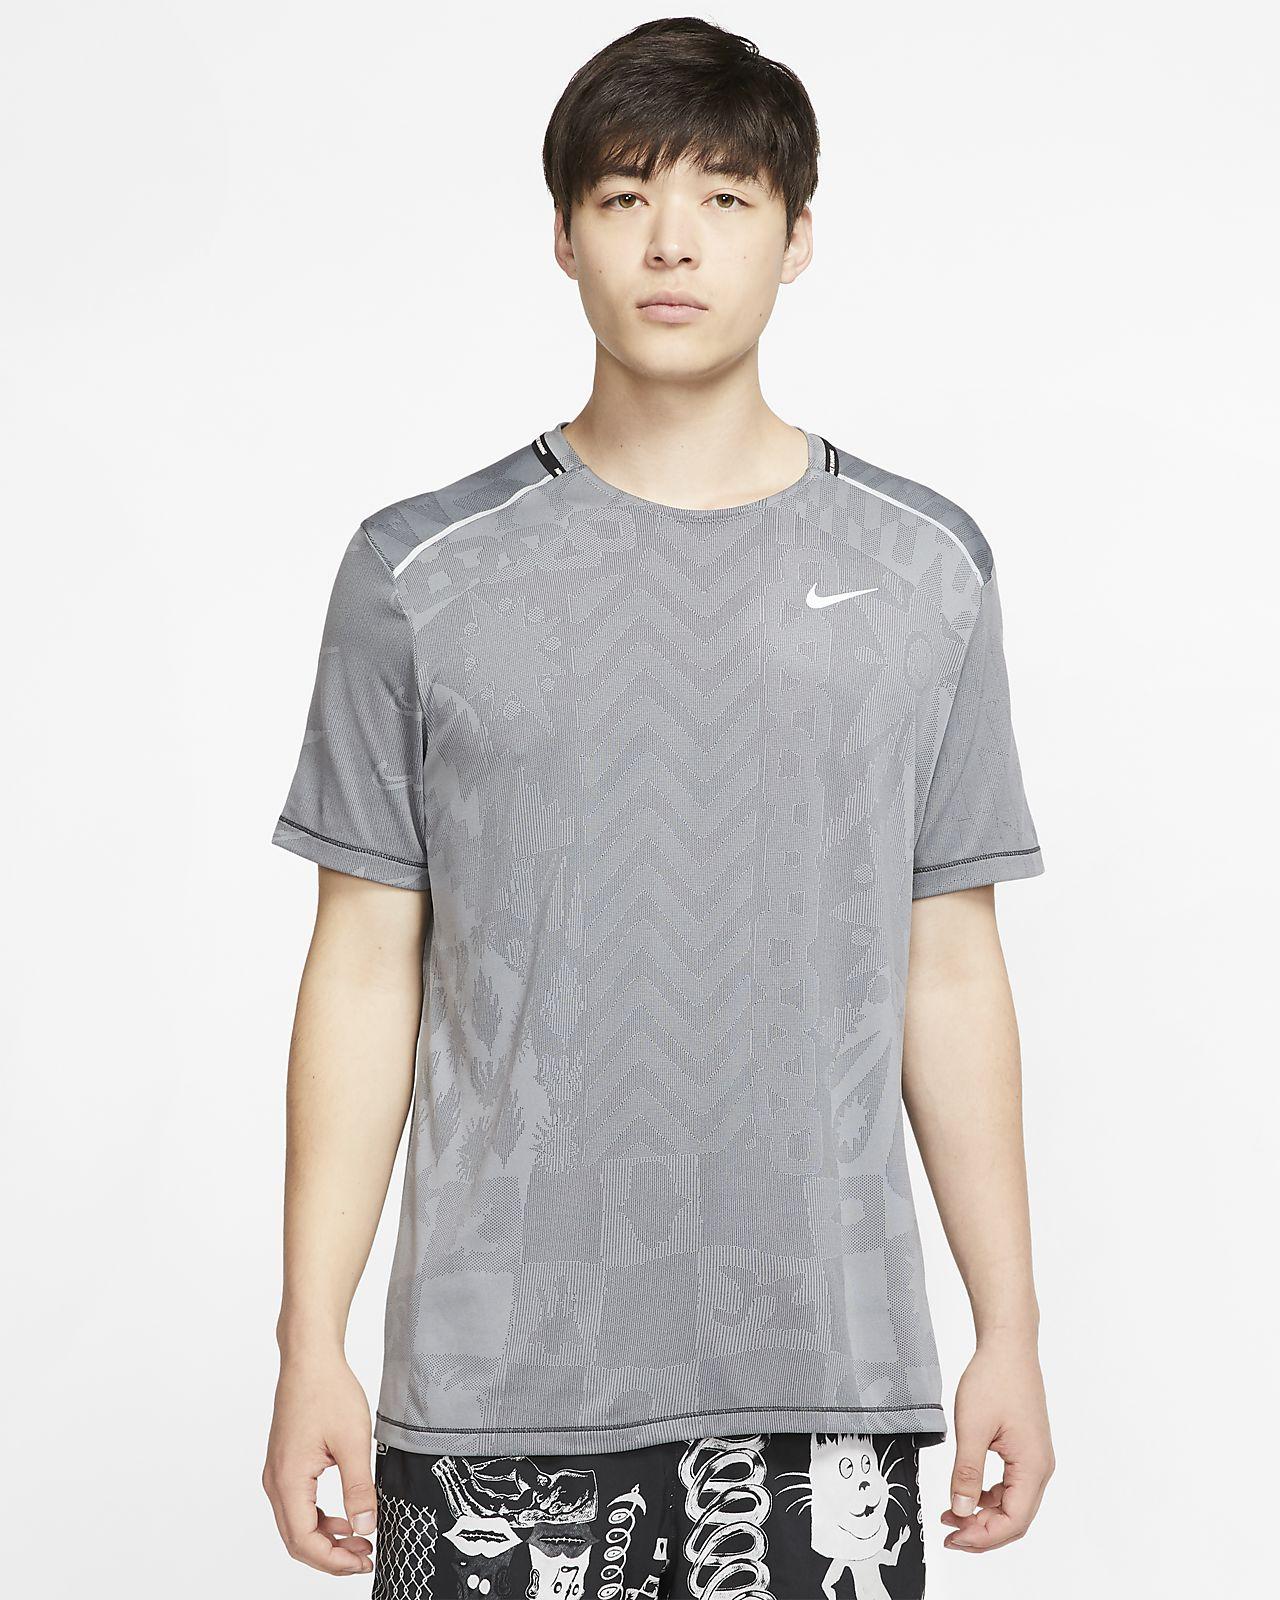 Nike TechKnit Wild Run Men's Running Top